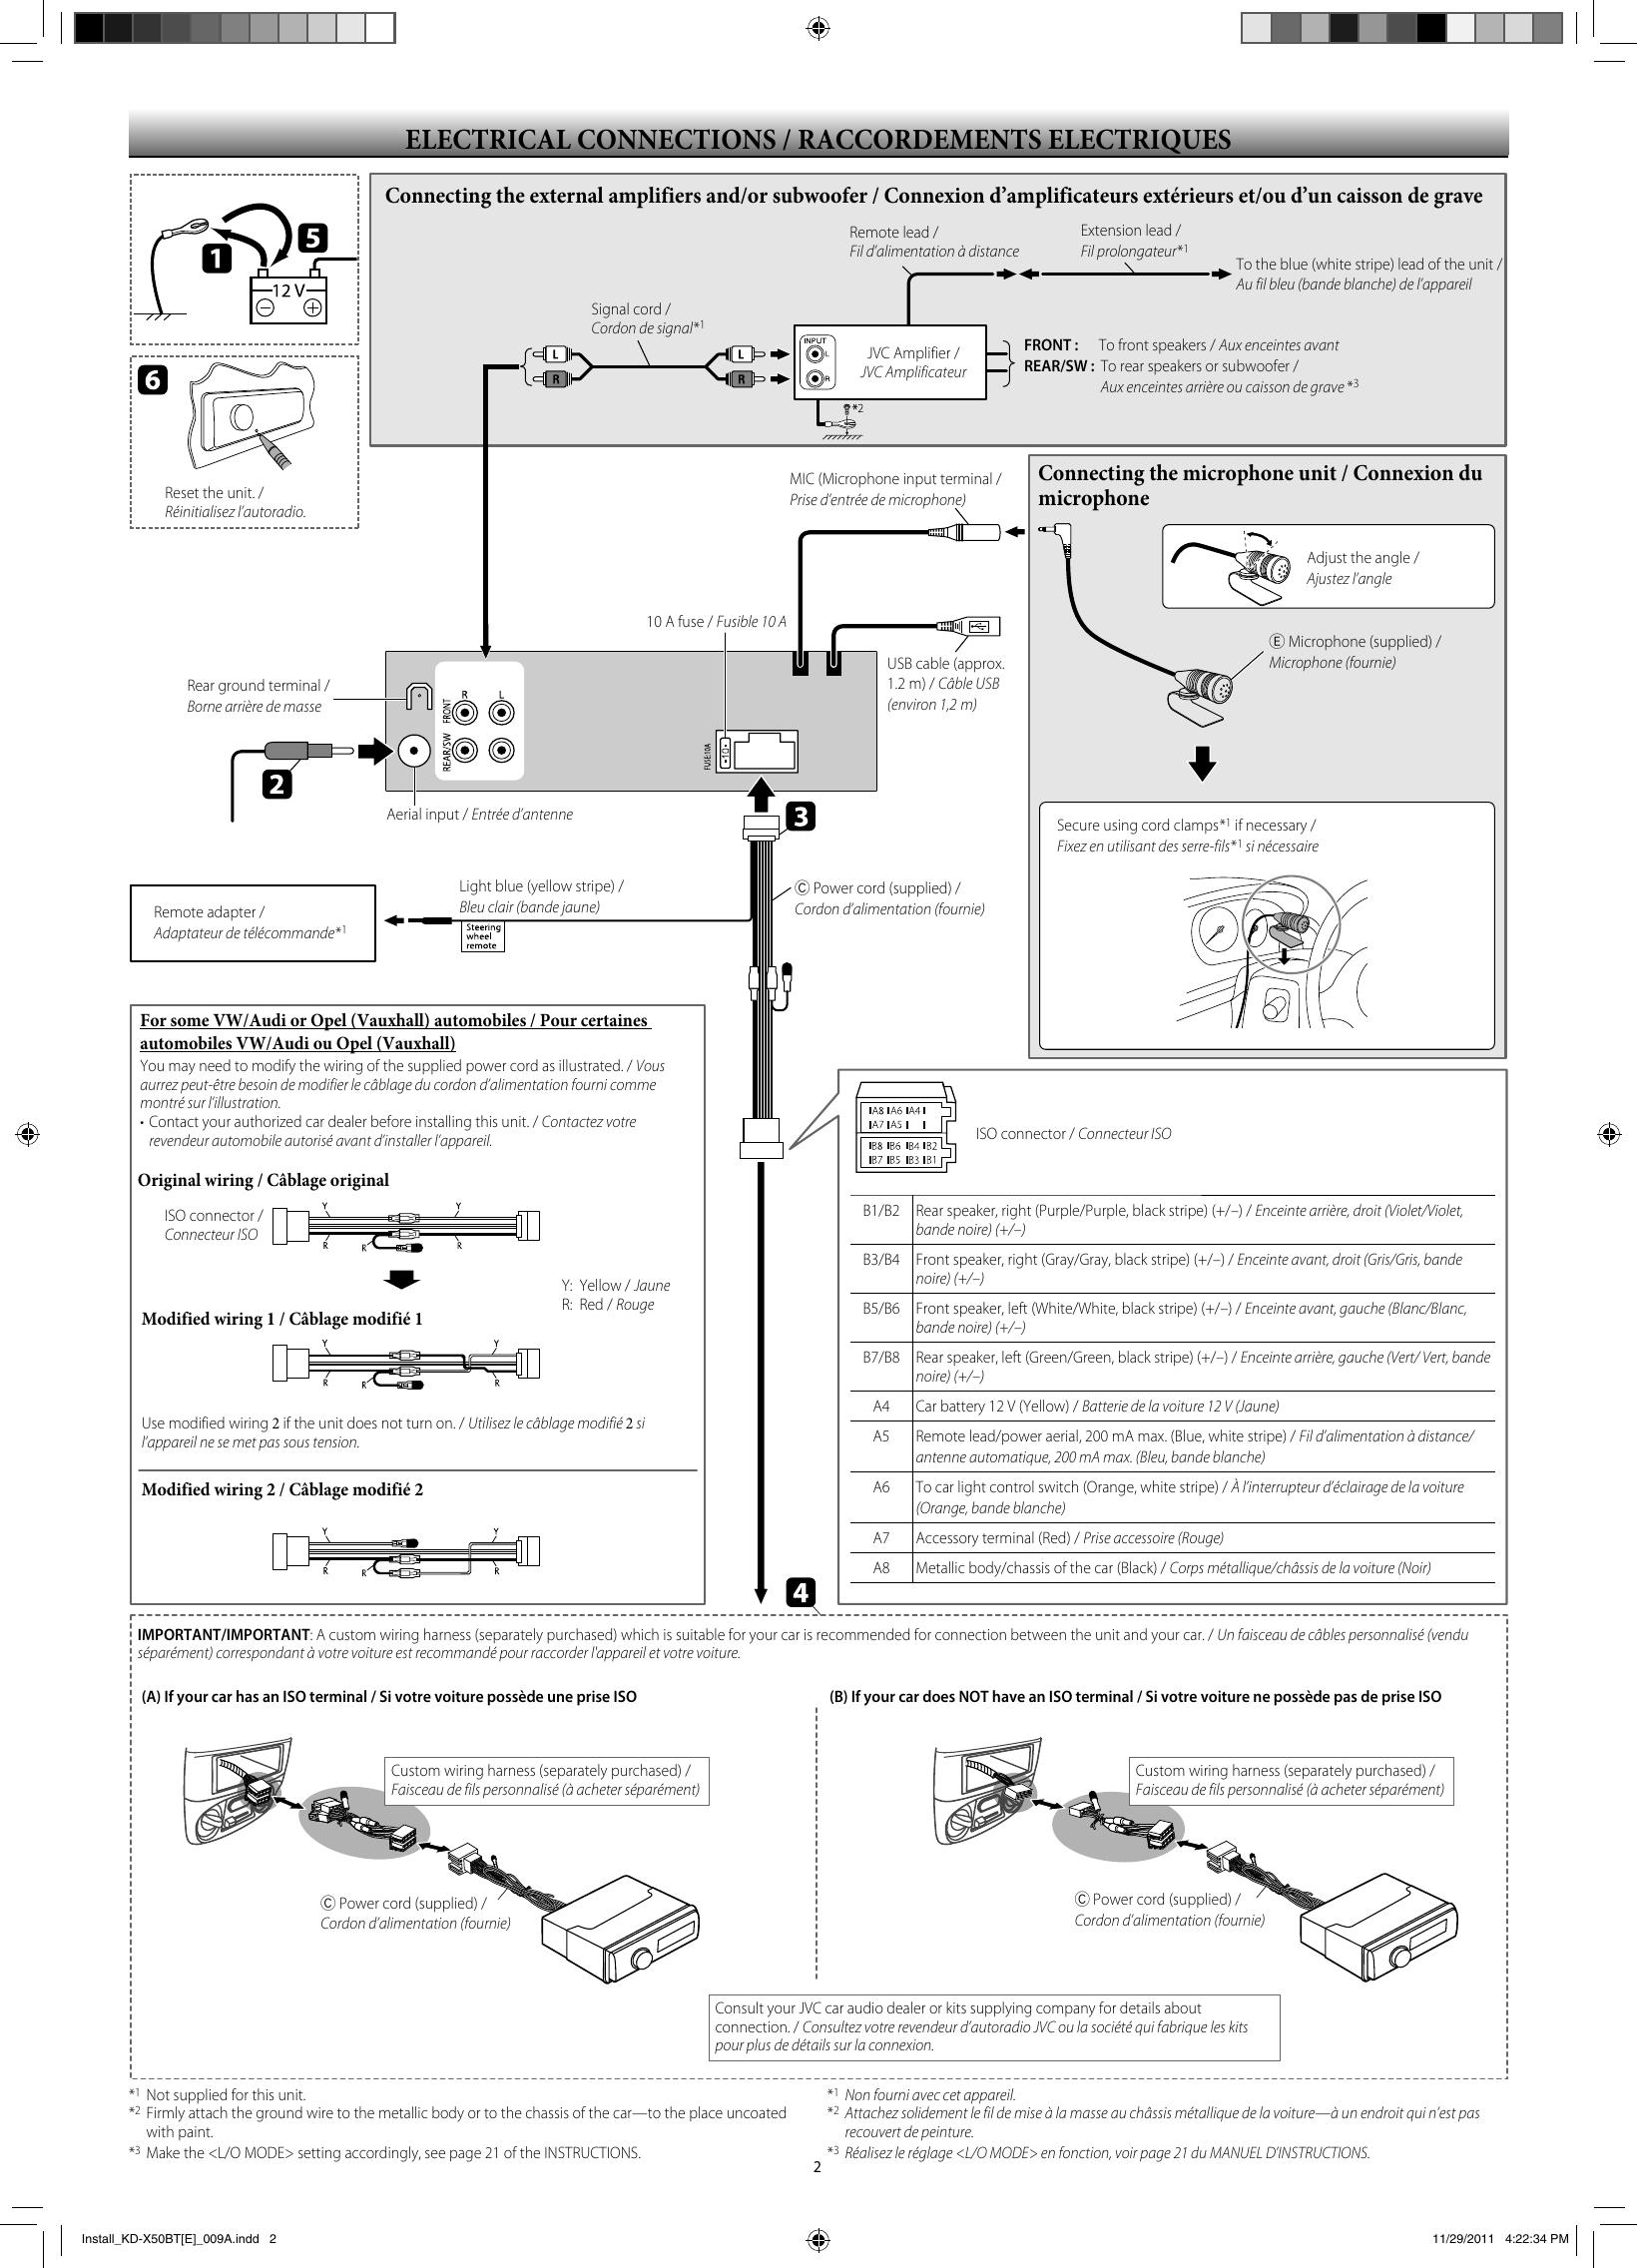 Jvc Kd X50bt Wiring Diagram - Wiring Diagrams Kds Bt Jvc Wire Harness Diagram on